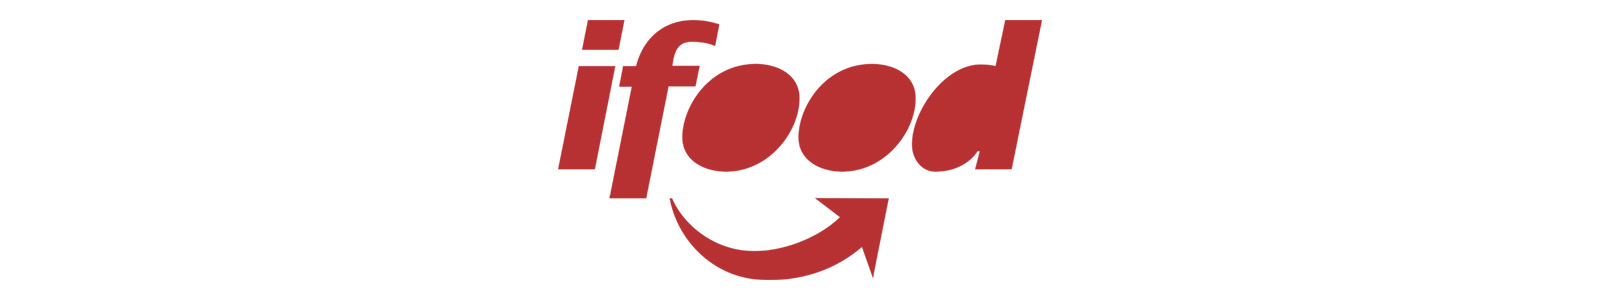 imagem-ifood-sac